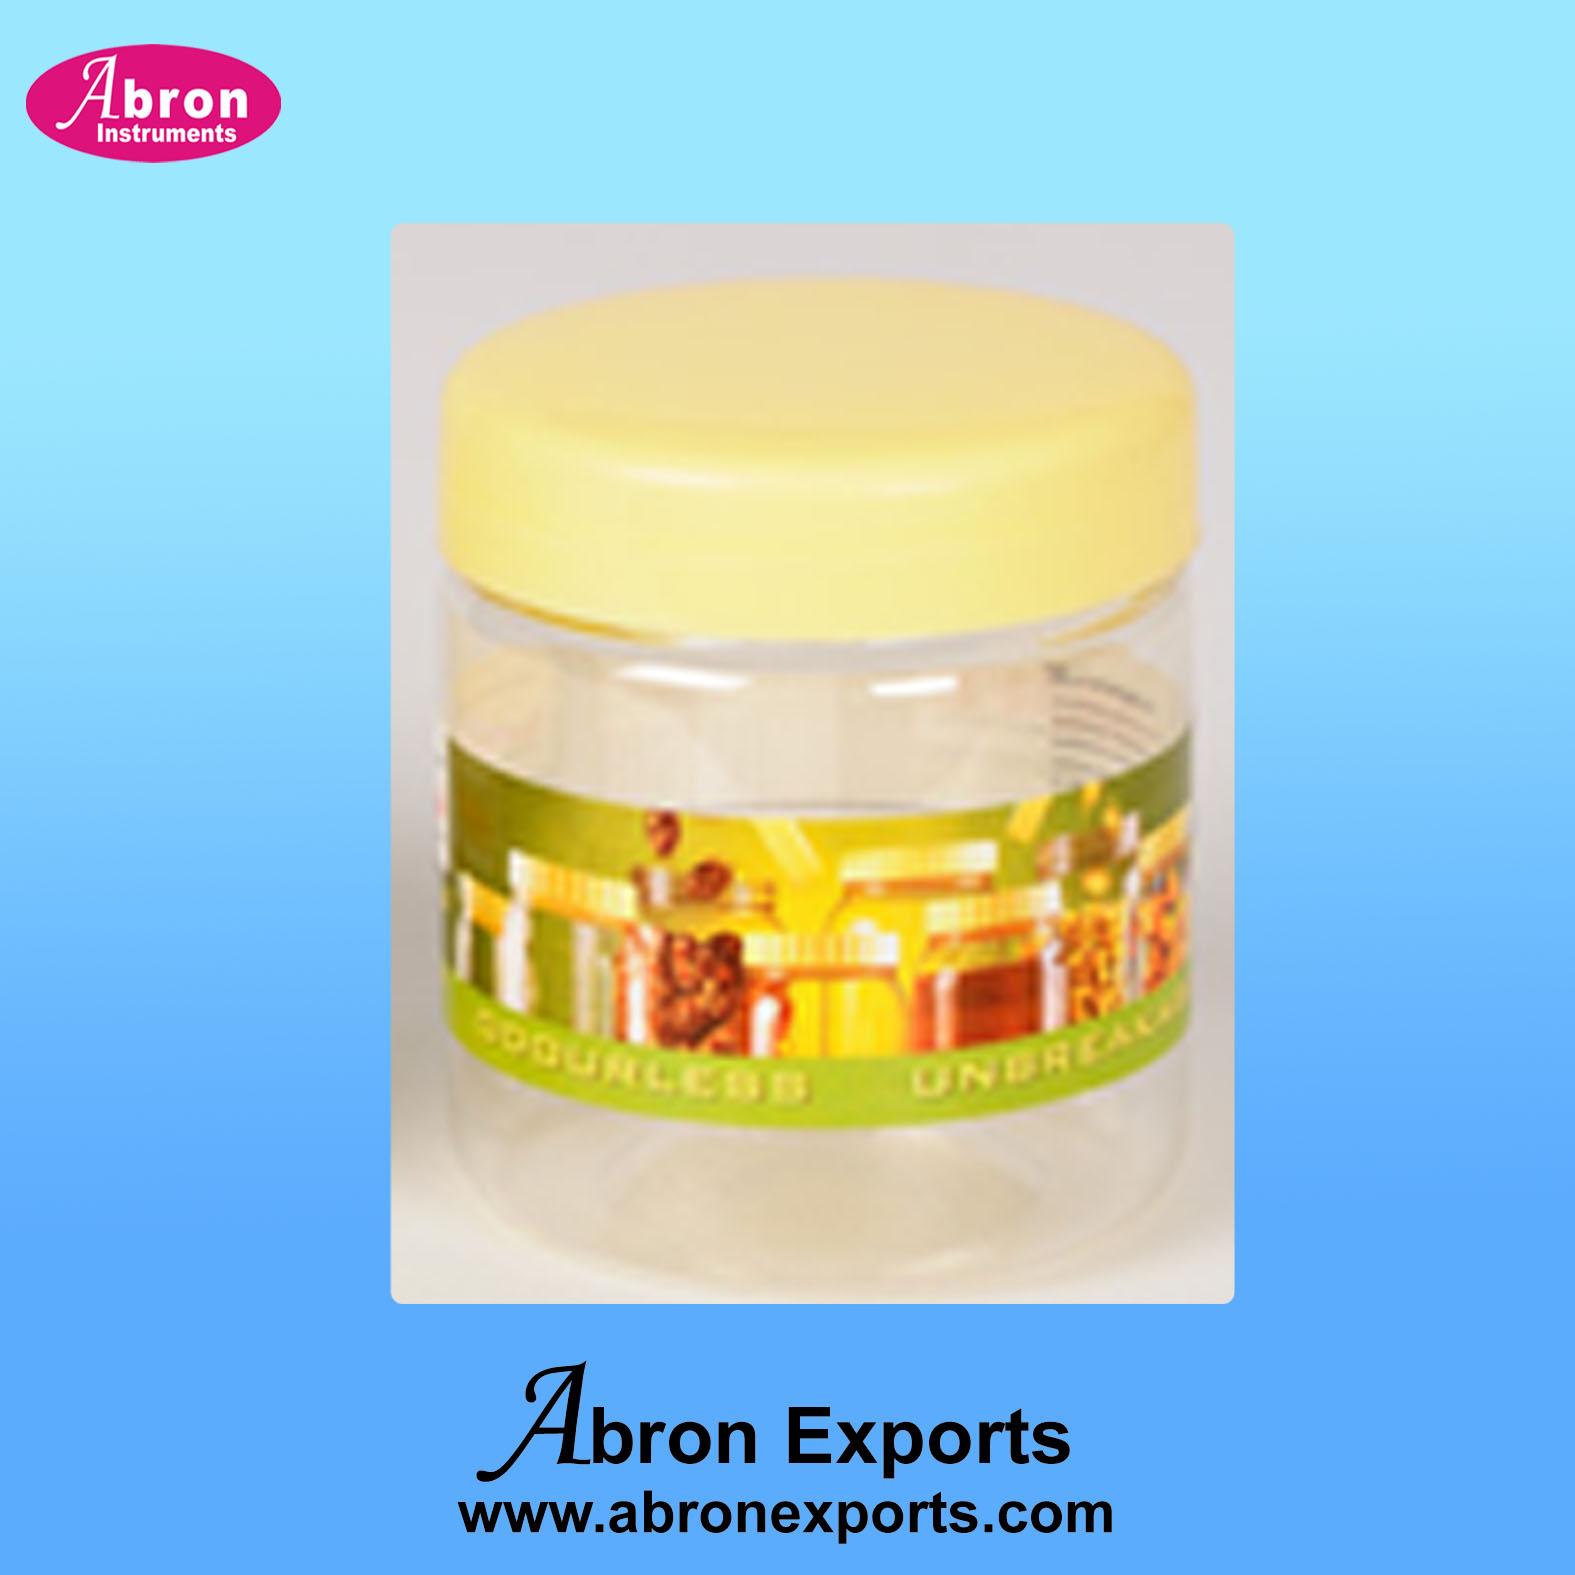 Honey Packing Cap Seal 70gm Abron AT-9516-70